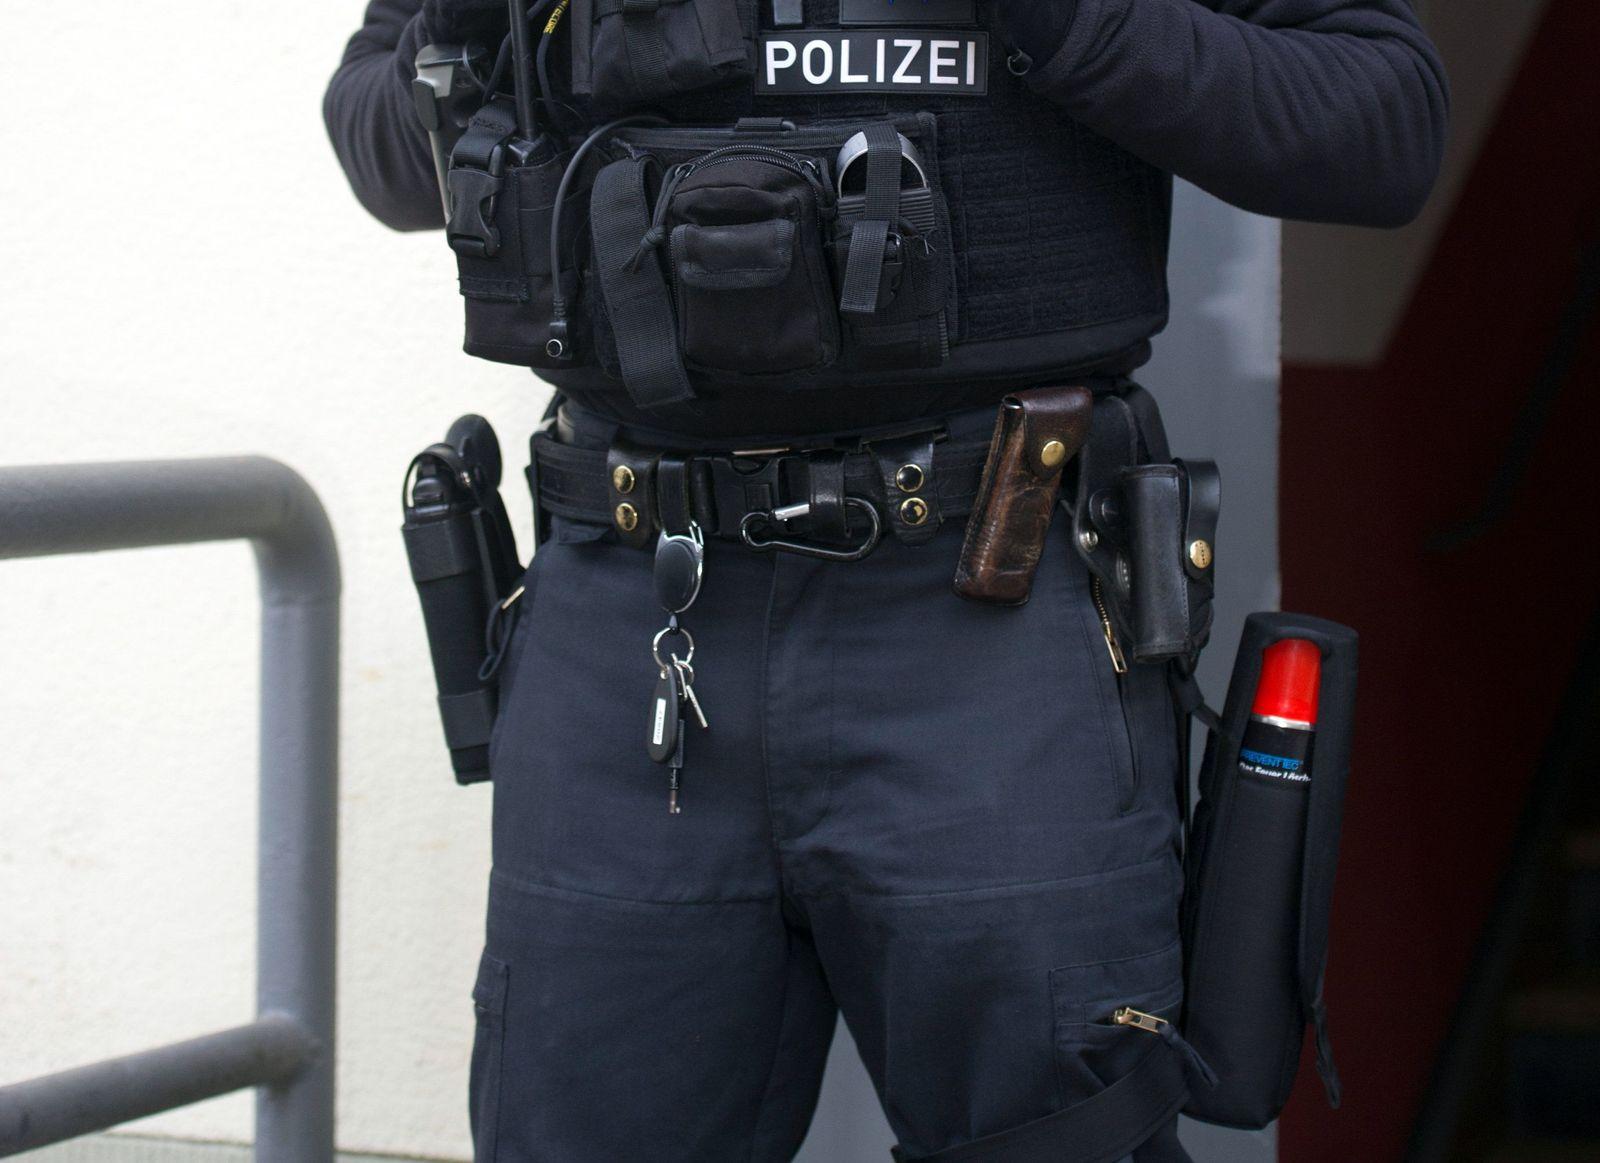 Berlin / Razzia / Islamisten / Polizisten